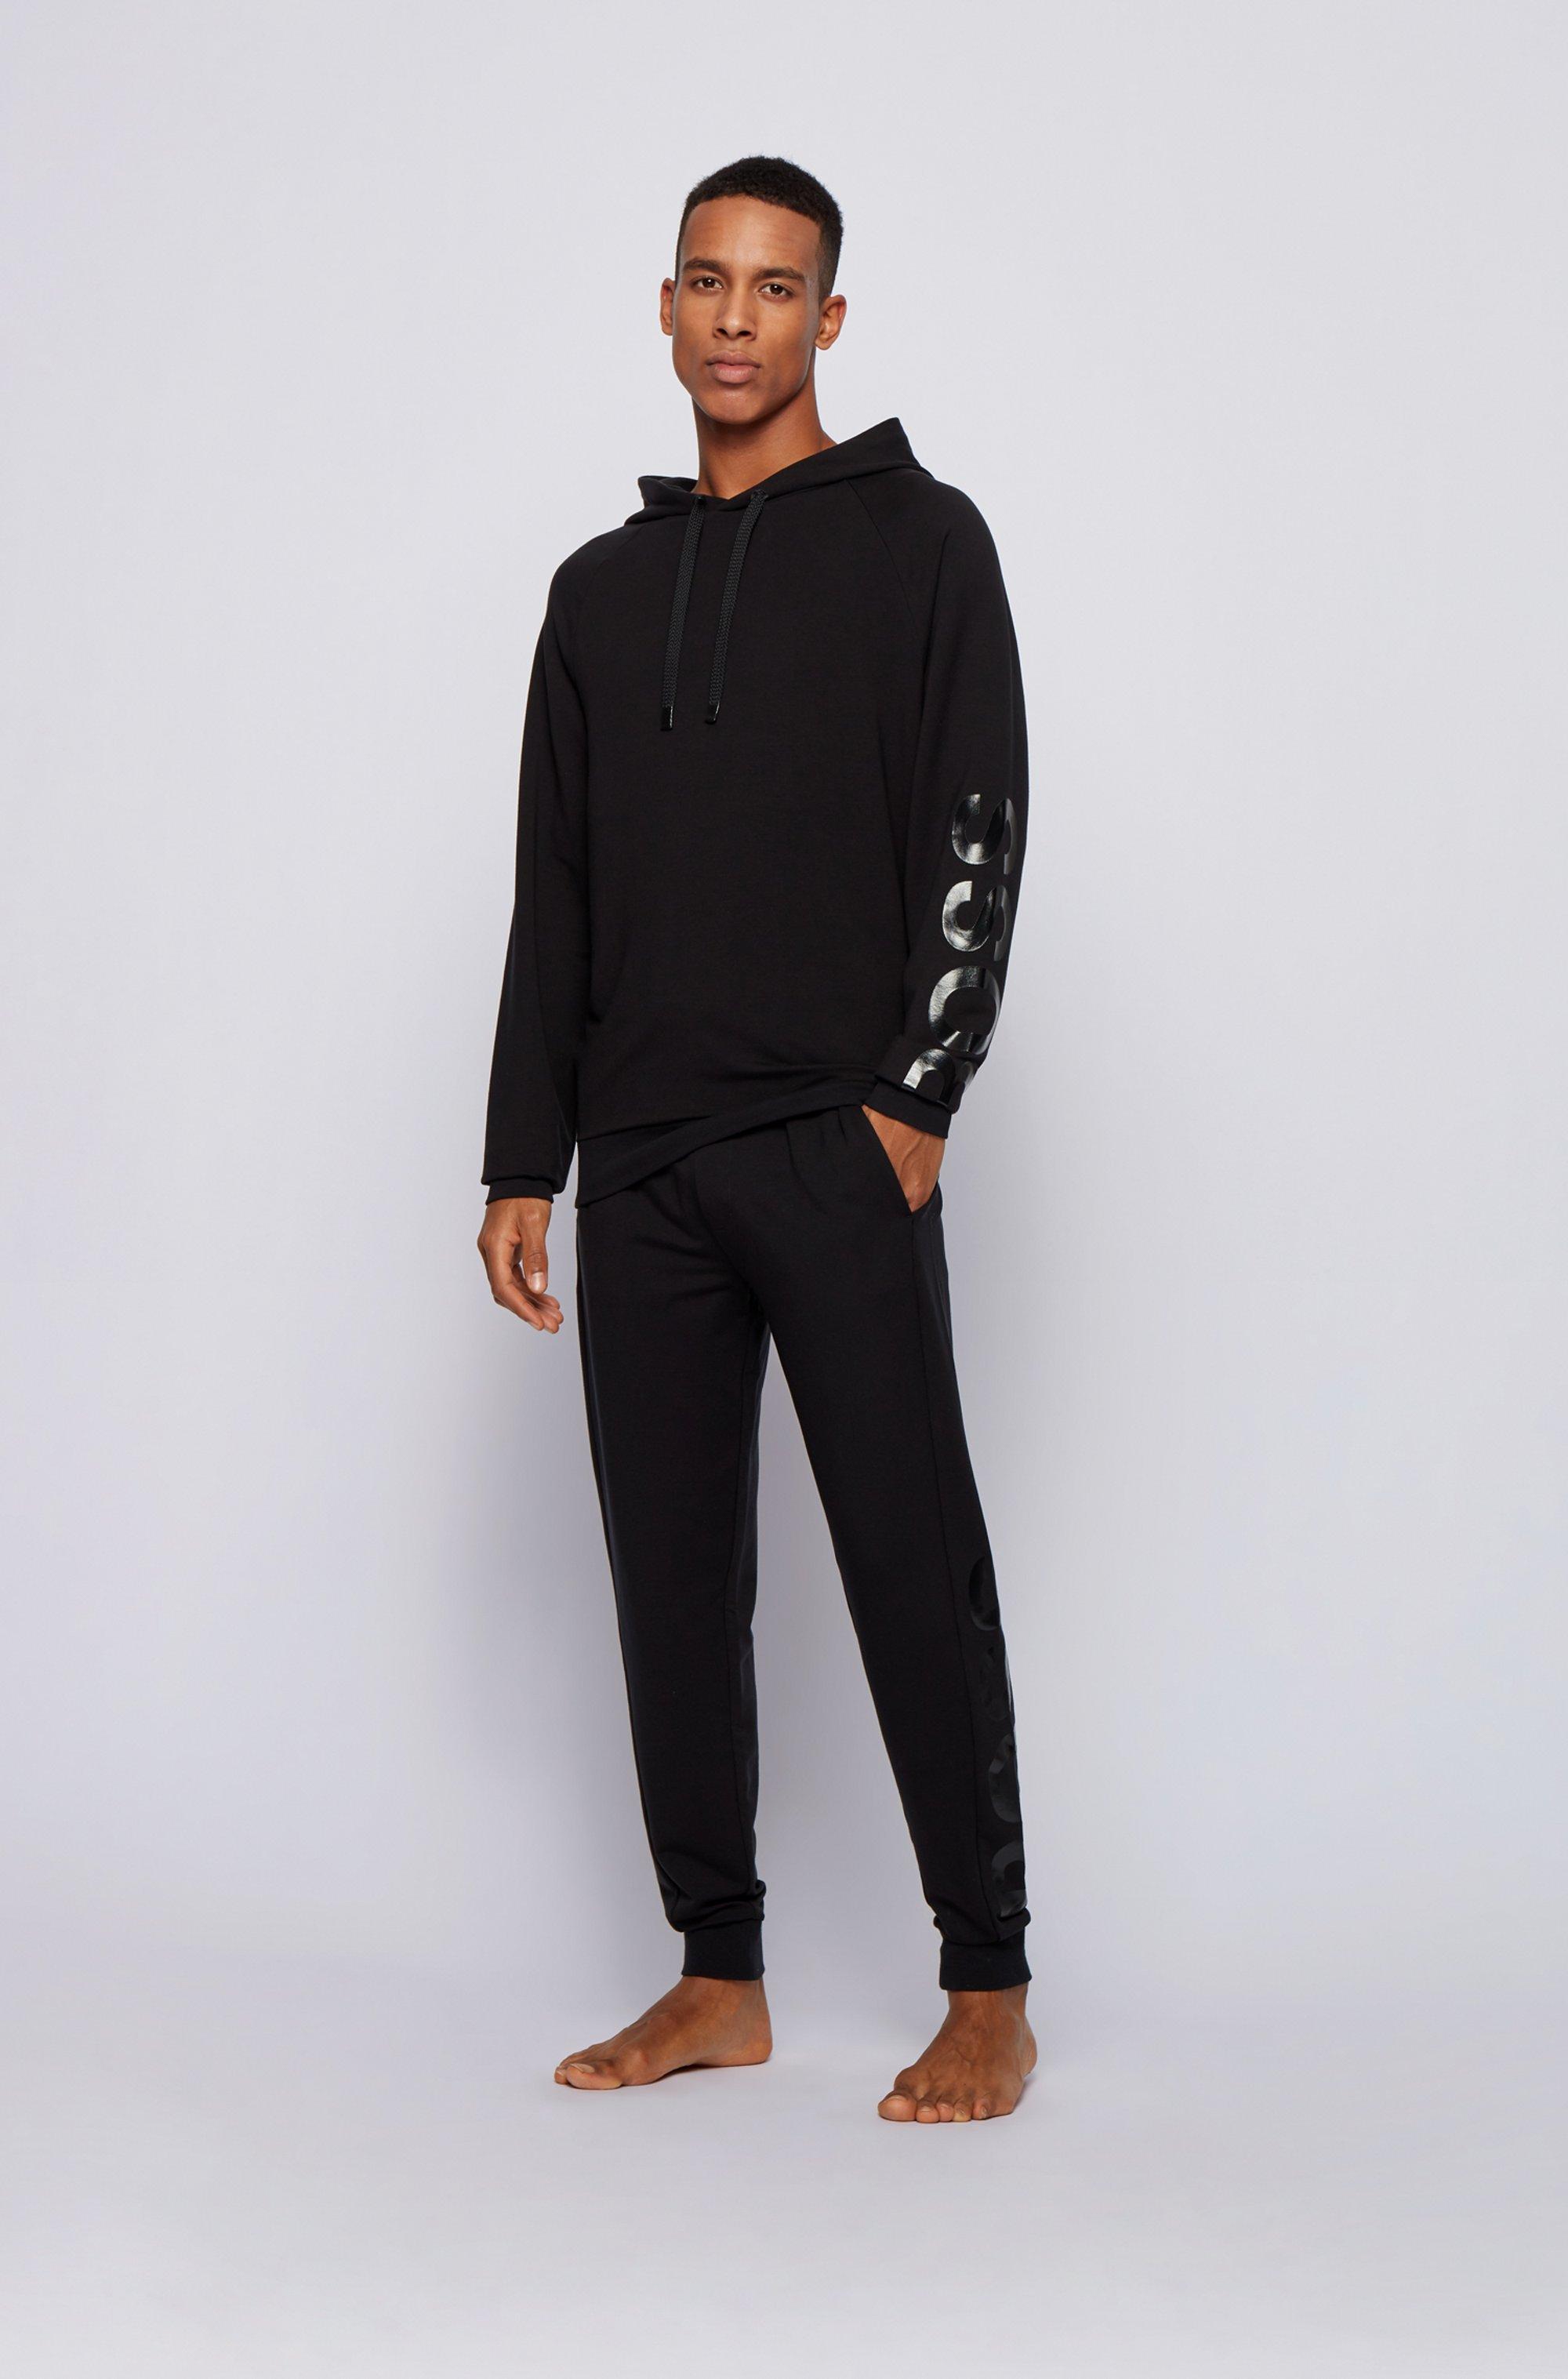 Hooded loungewear sweatshirt with sleeve logo